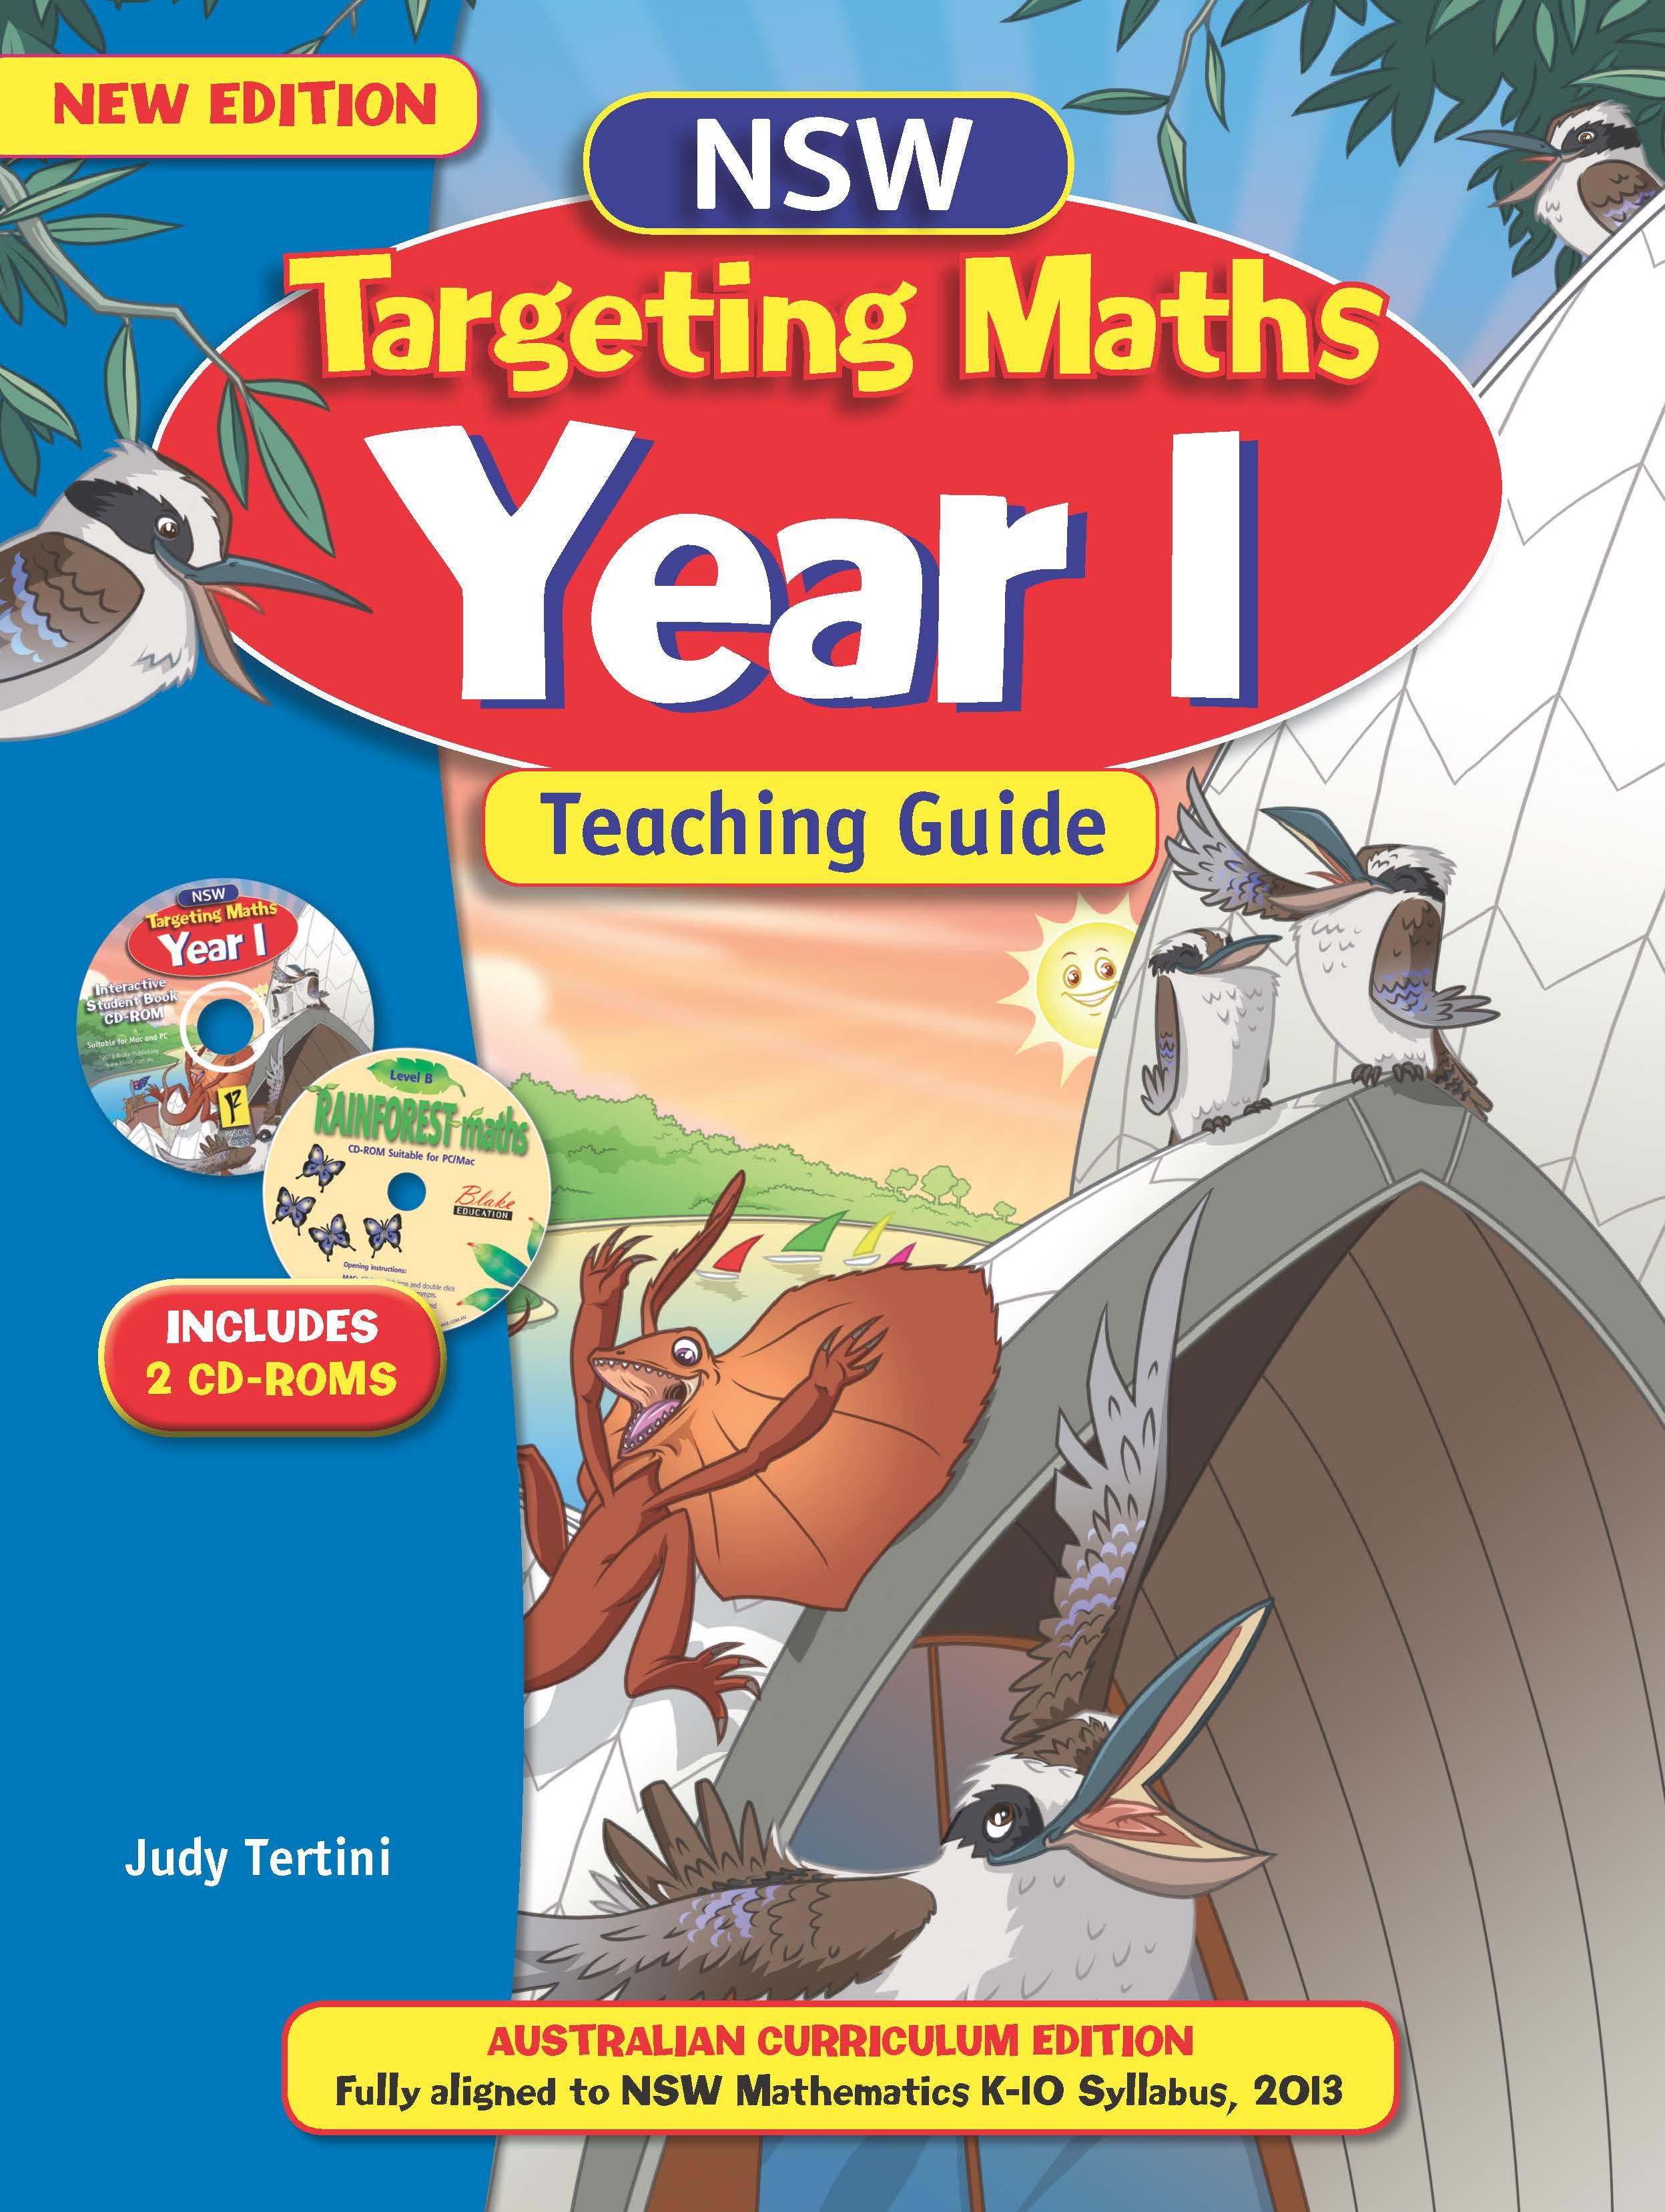 NSW Targeting Maths Australian Curriculum Teaching Guide Year 1